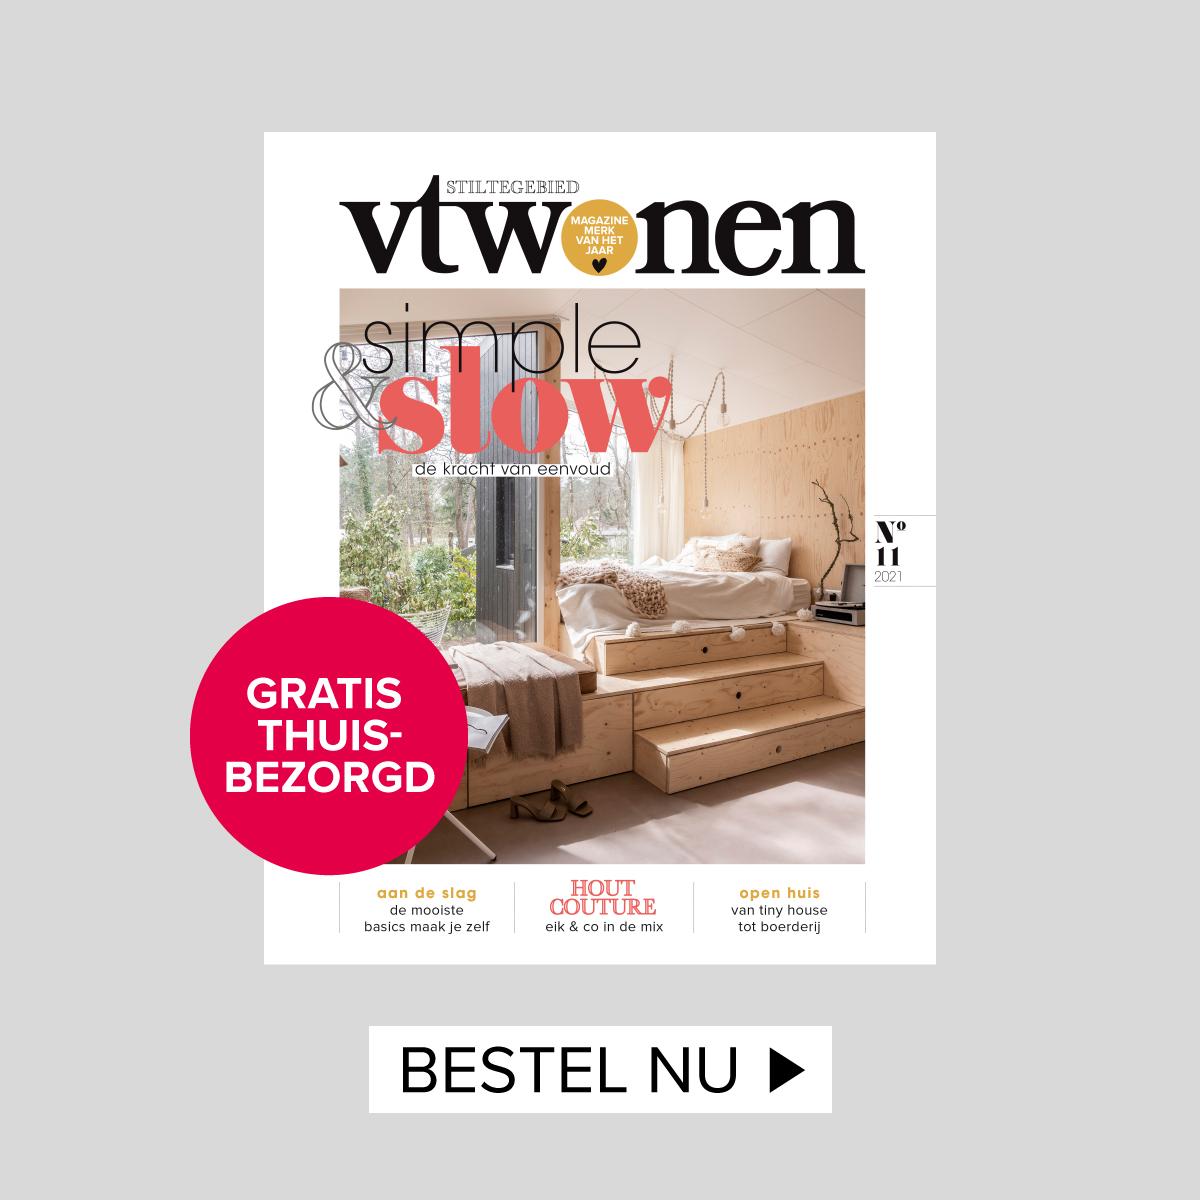 vtwonen magazine 11-2021